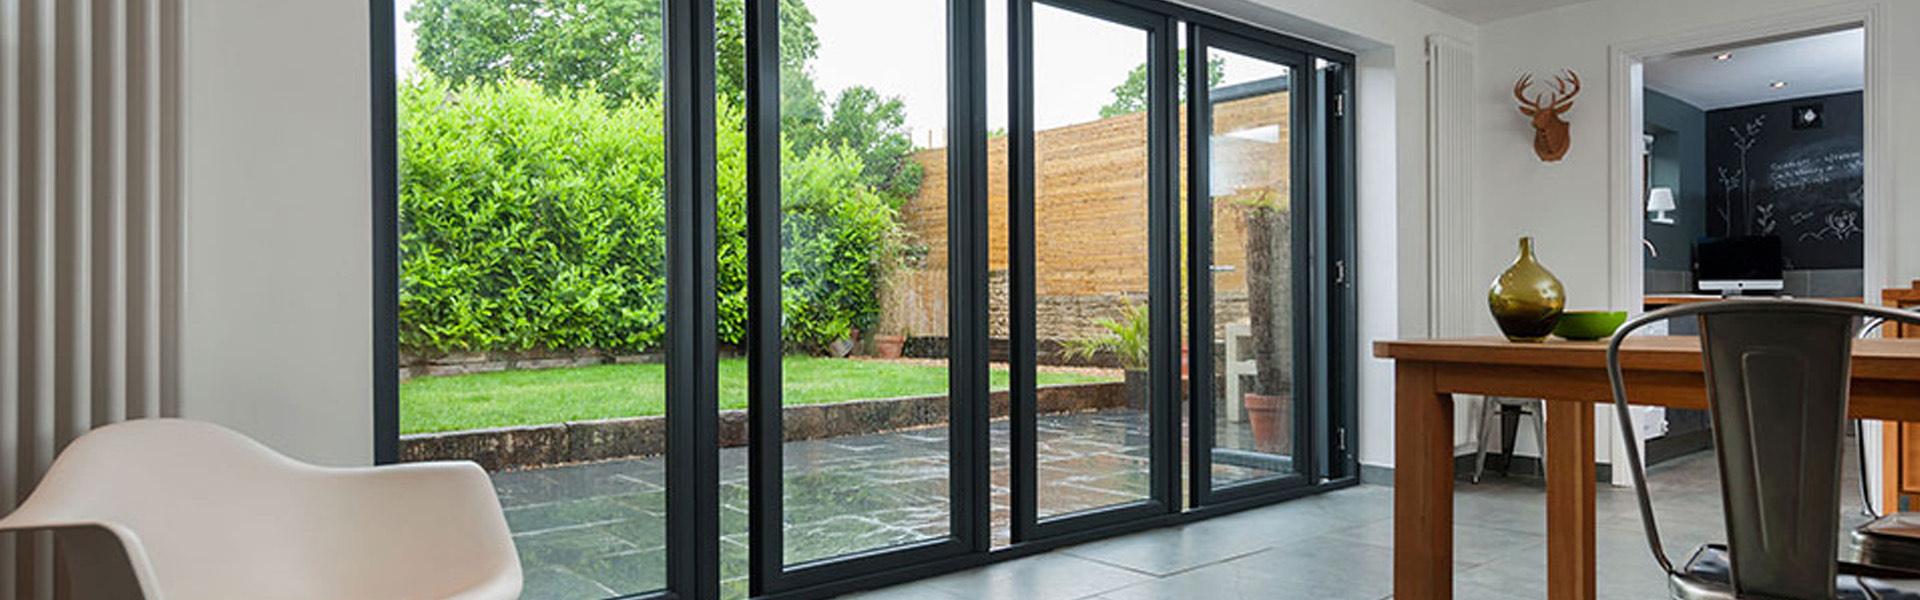 Double Glazing Broadstairs